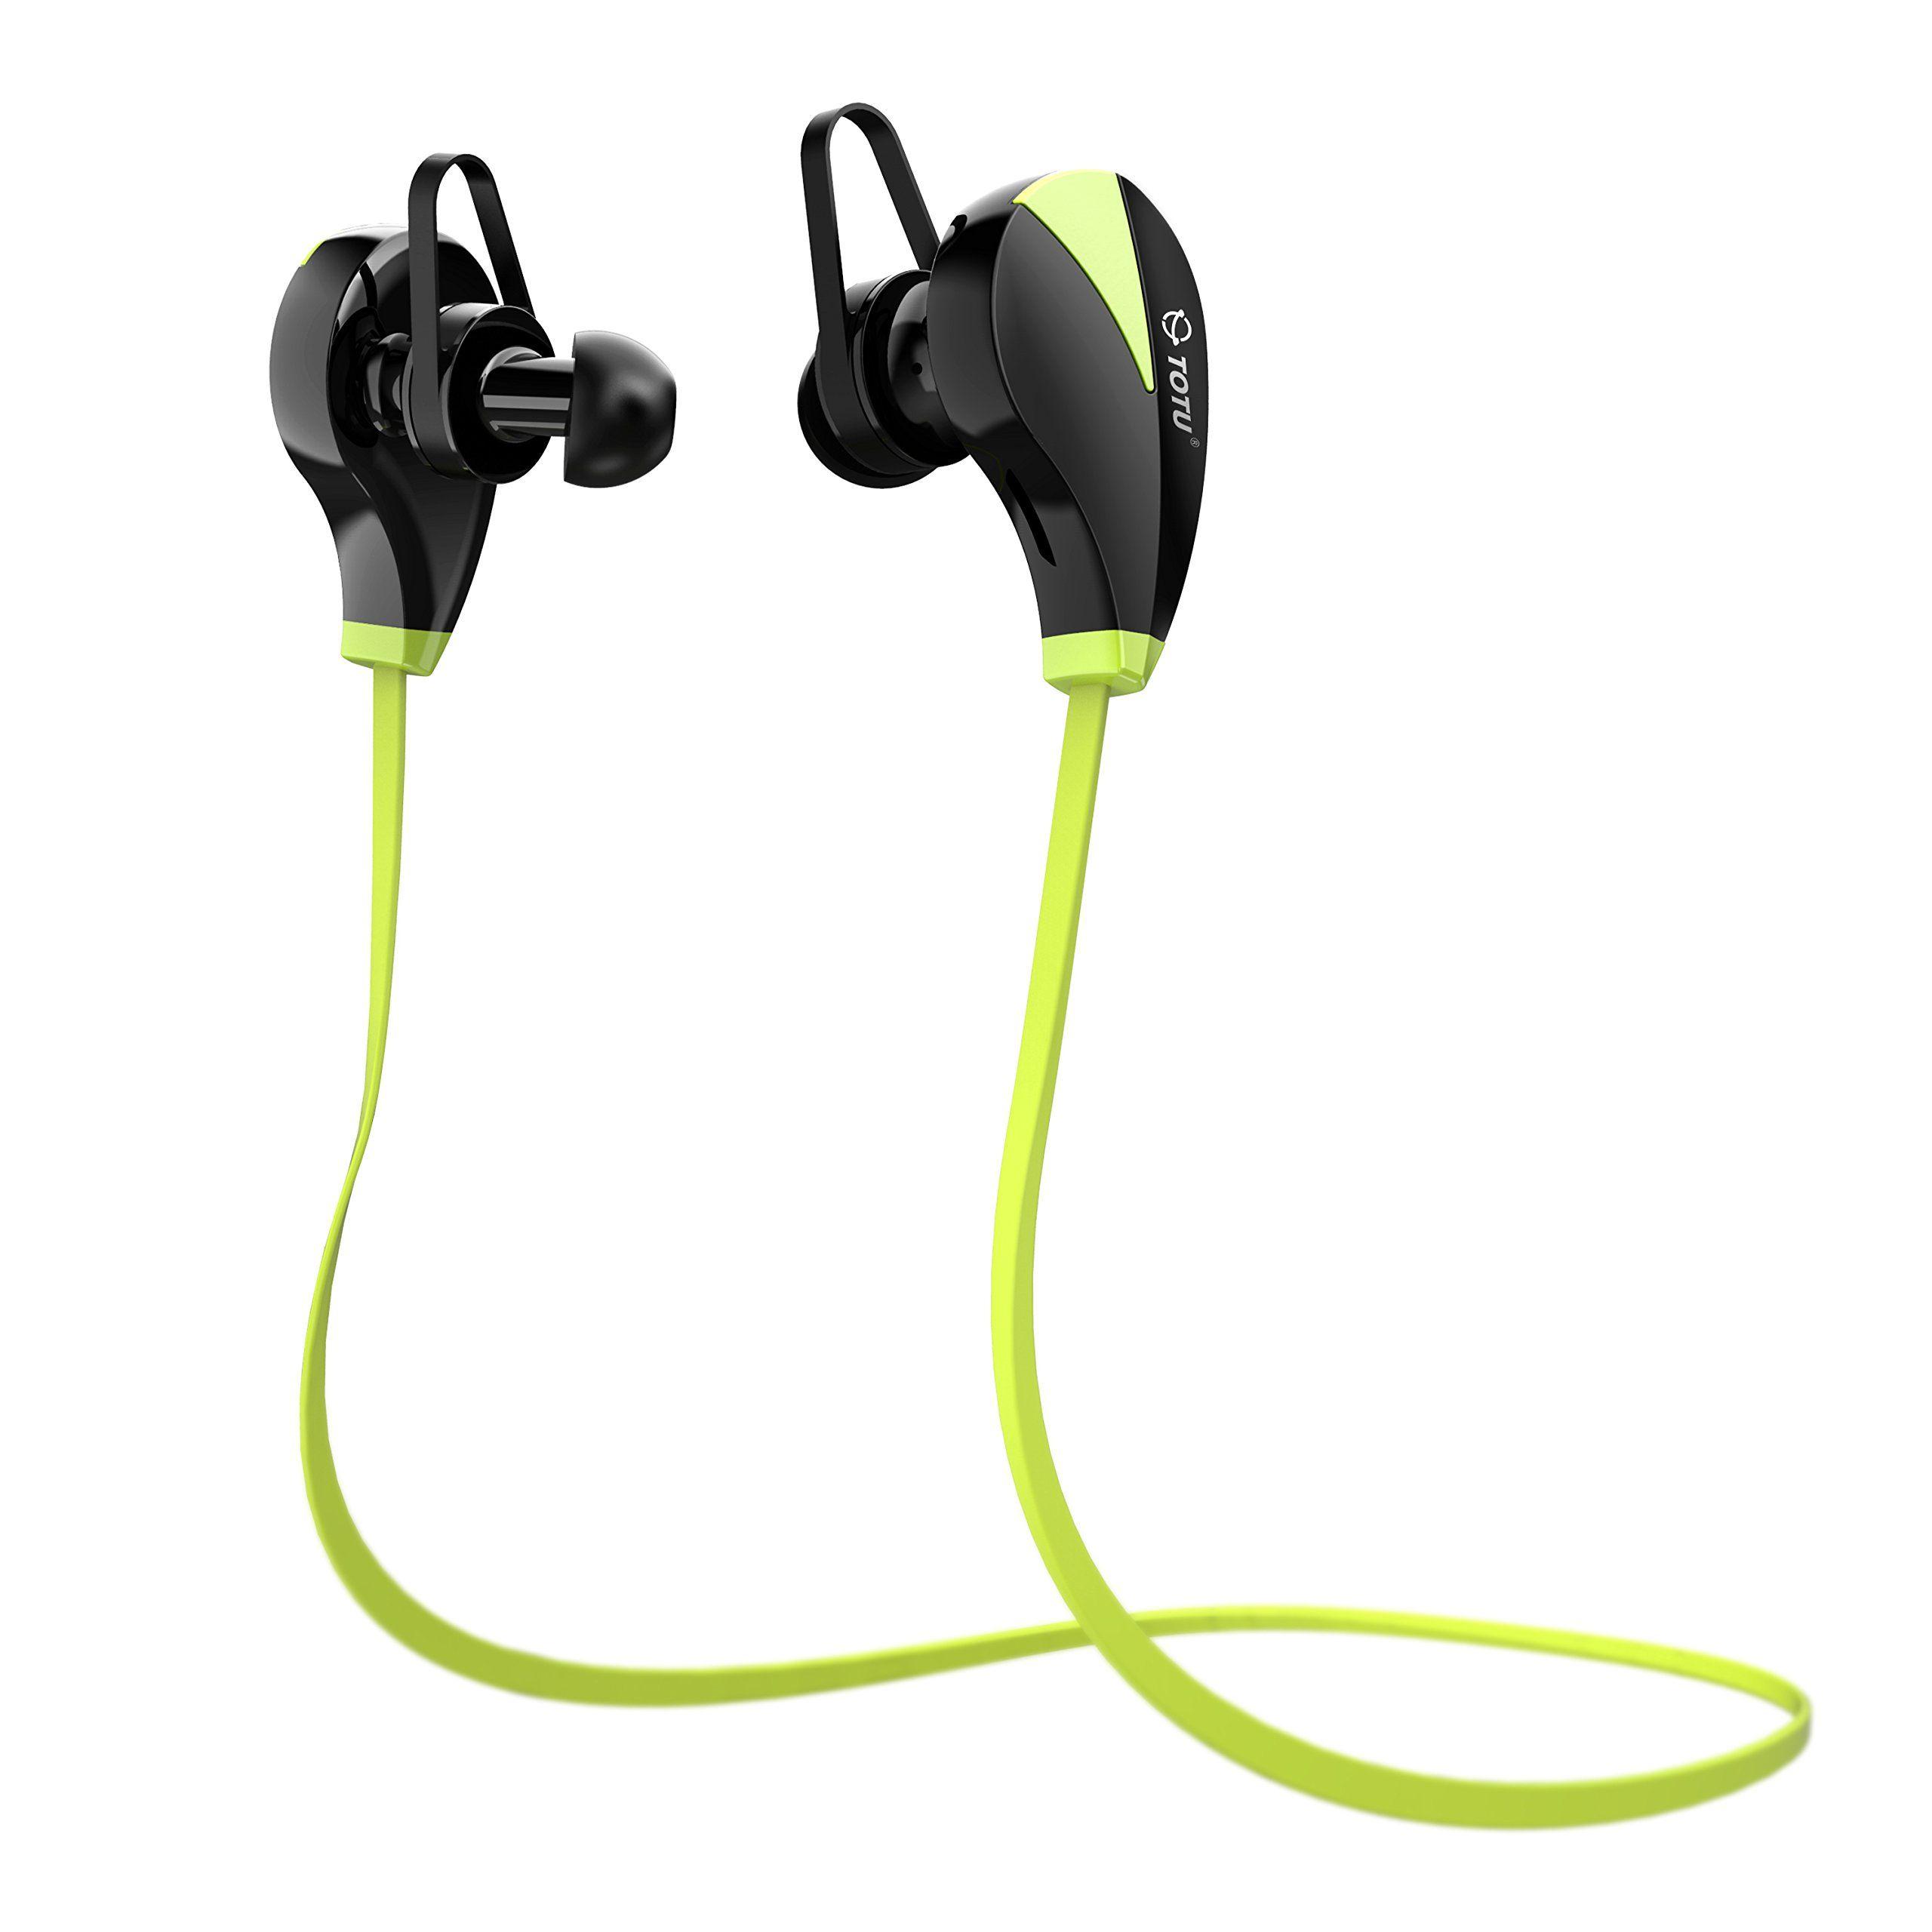 Bluetooth Headphones, TOTU Wireless V4.1 Stereo Noise